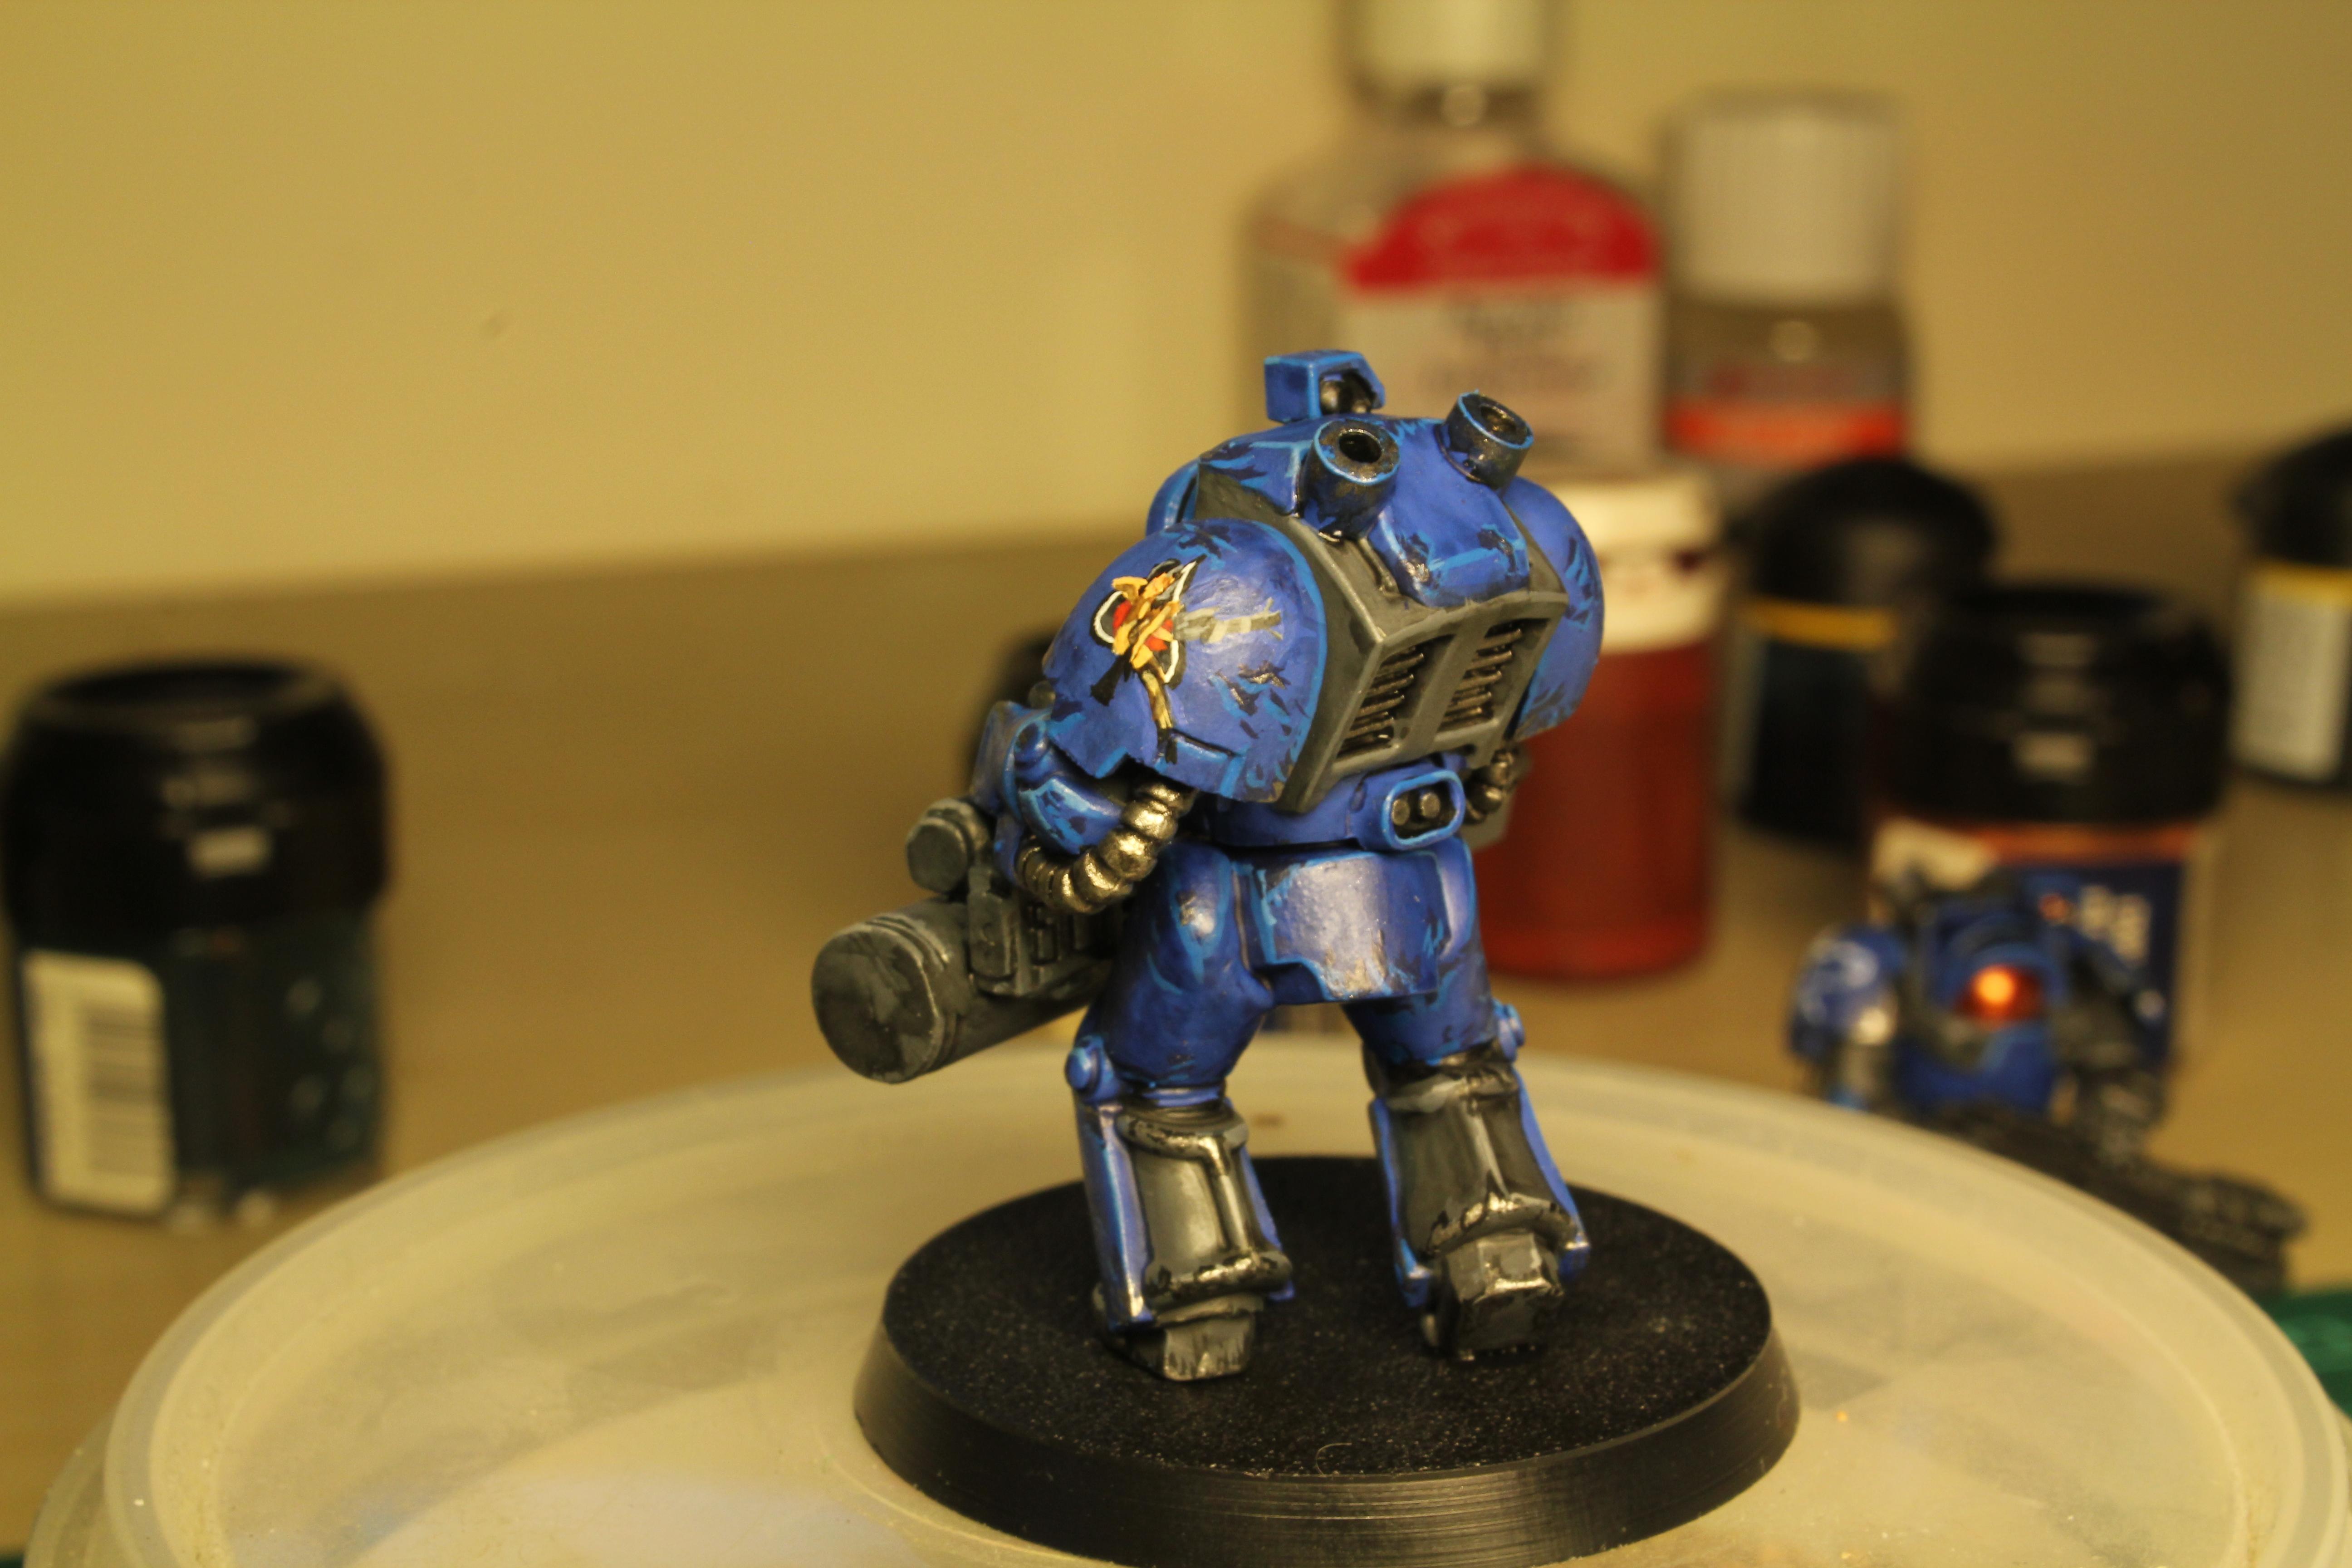 Deathwing, Sc2, Space Marines, Terminator Armor, Terran